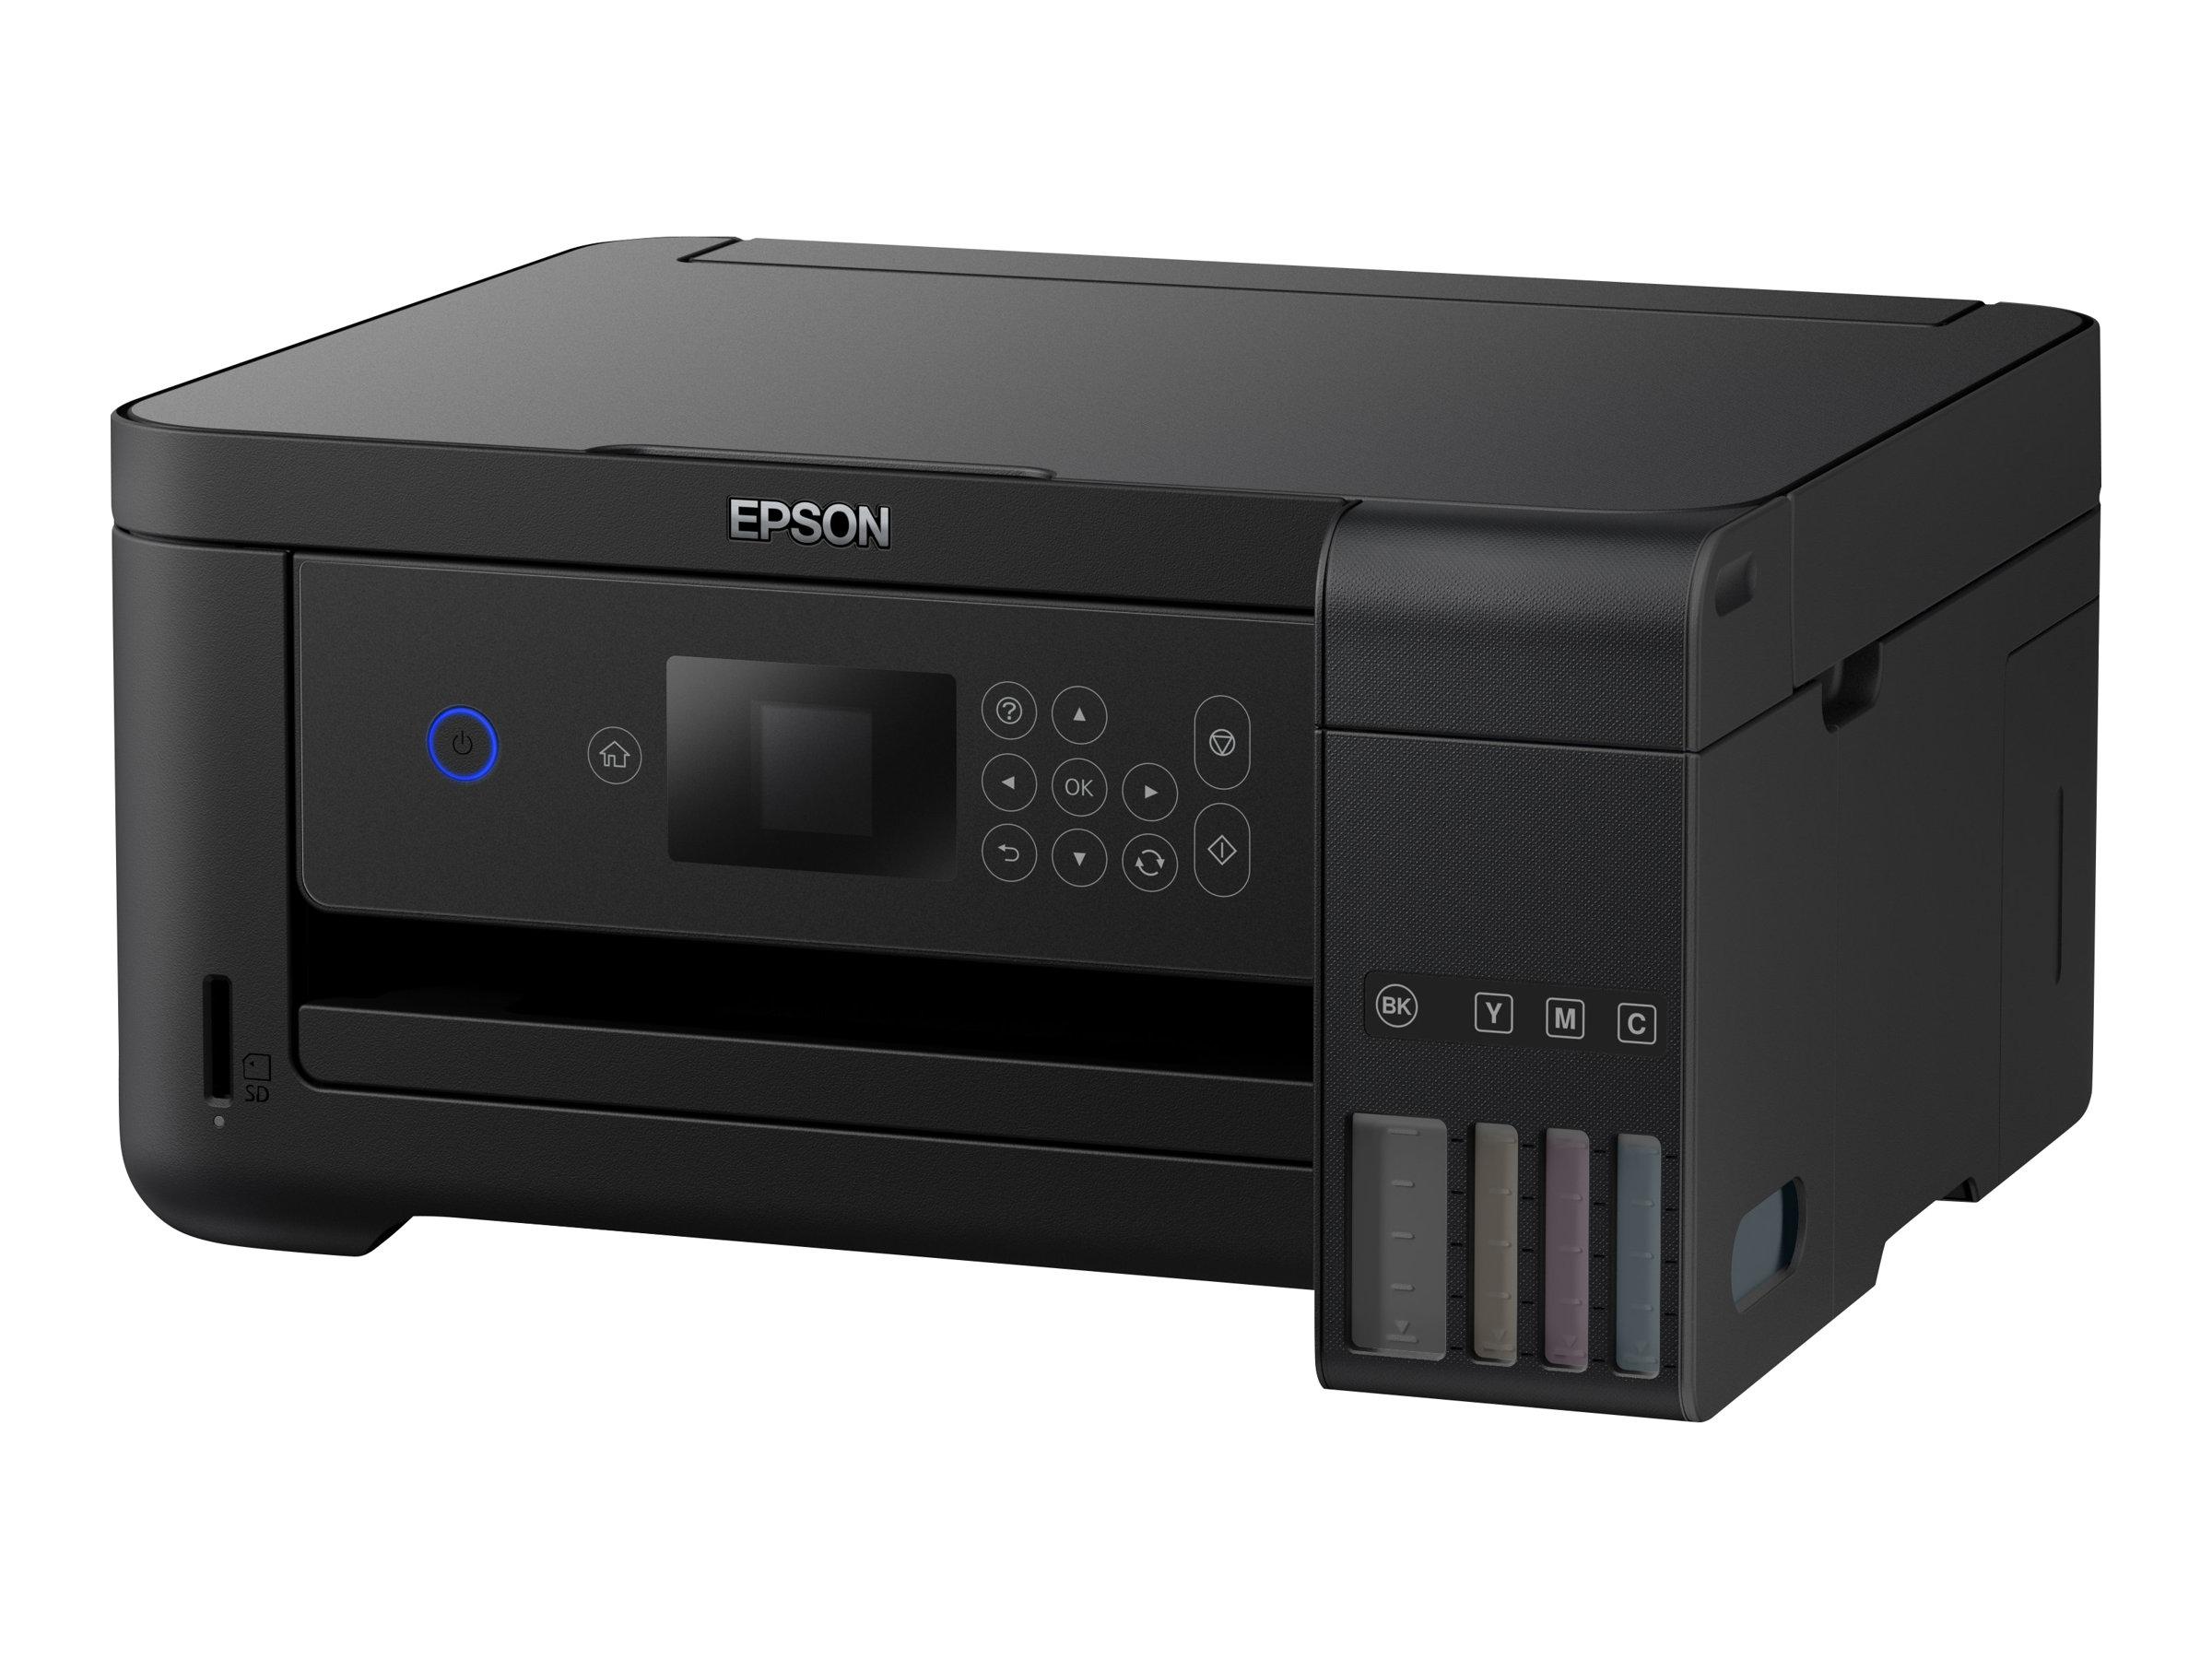 Epson EcoTank ET-2750 - Multifunktionsdrucker - Farbe - Tintenstrahl - Letter A (216 x 279 mm)/A4 (210 x 297 mm) (Original) - A4